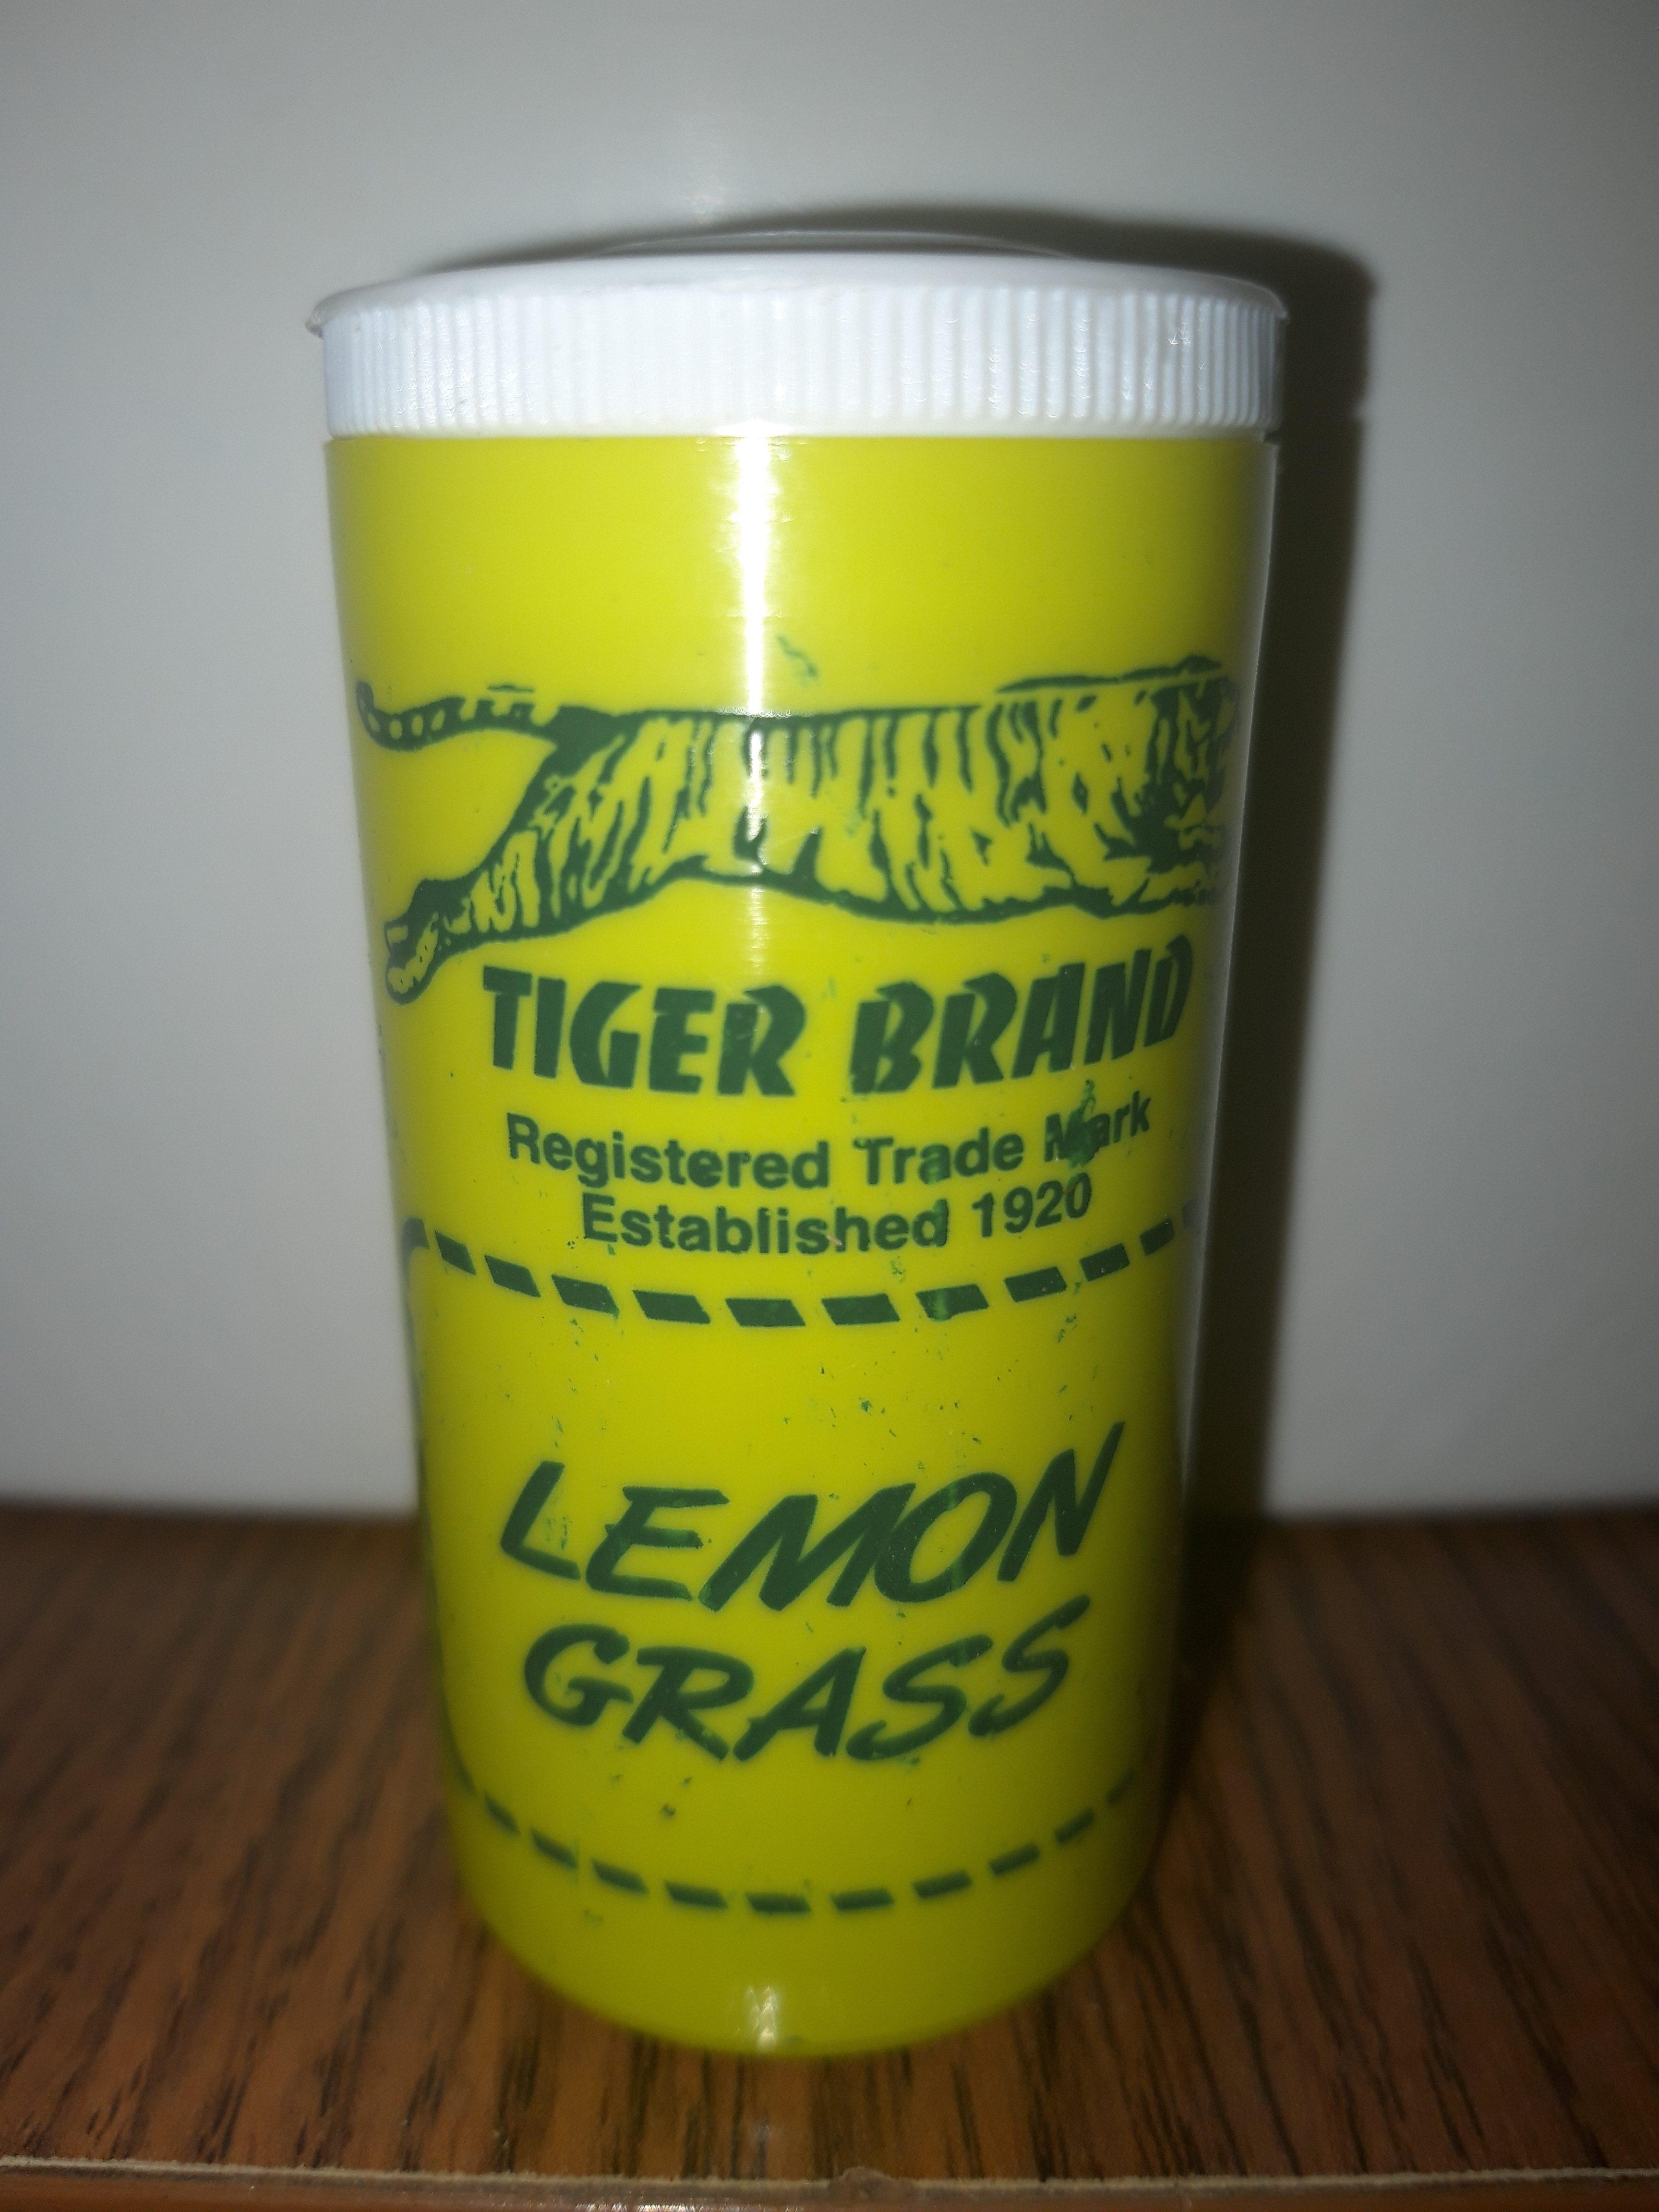 TIGER BRAND LEMON GRASS